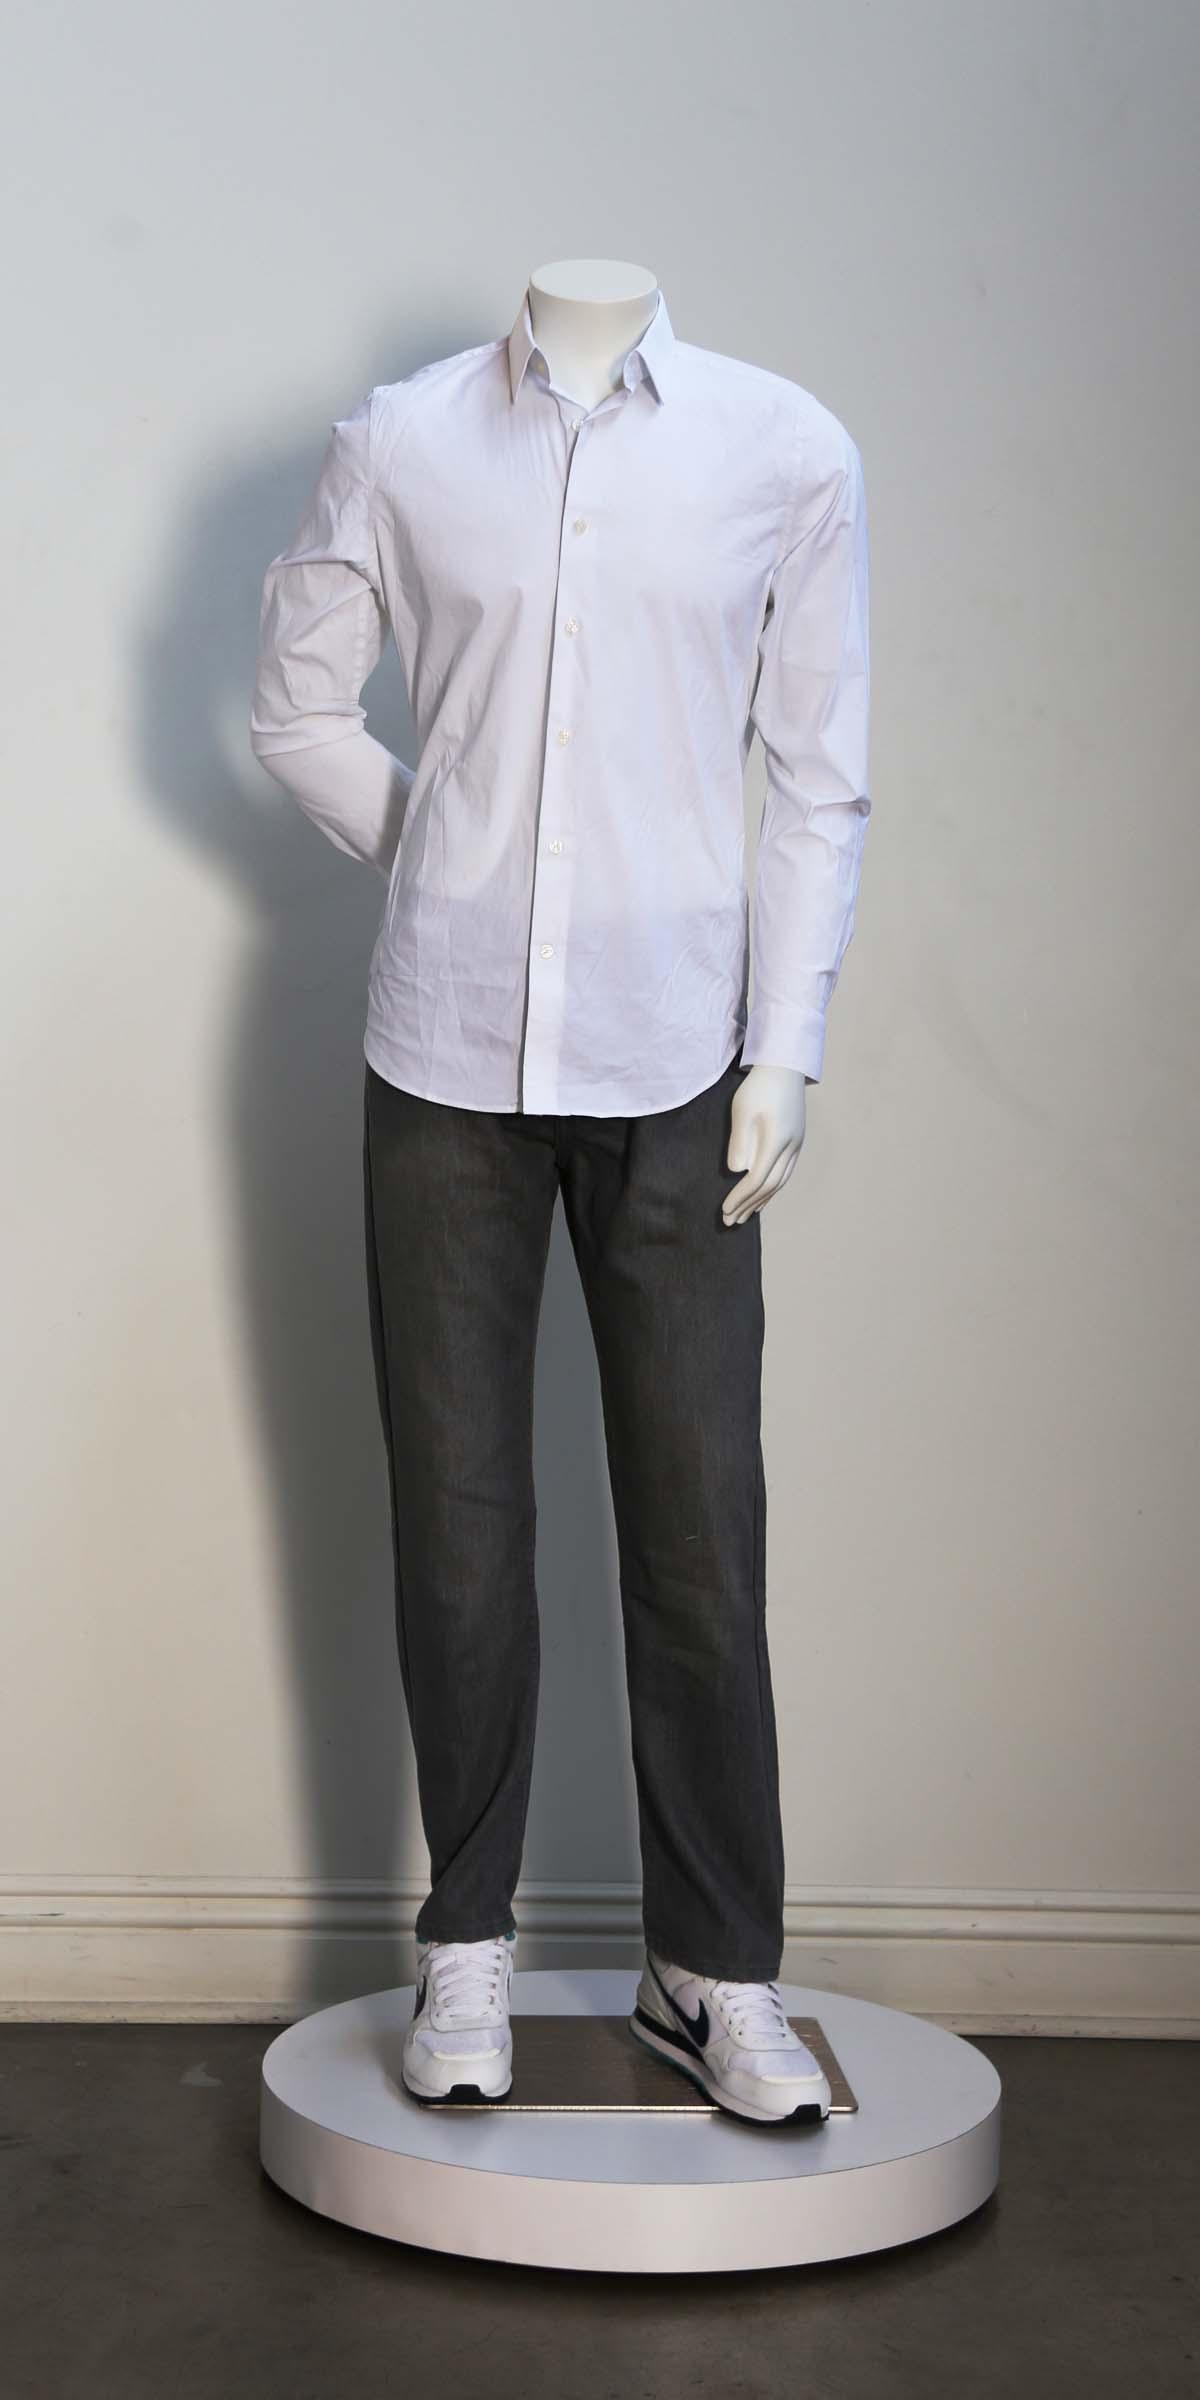 JM2003-2 Dressed